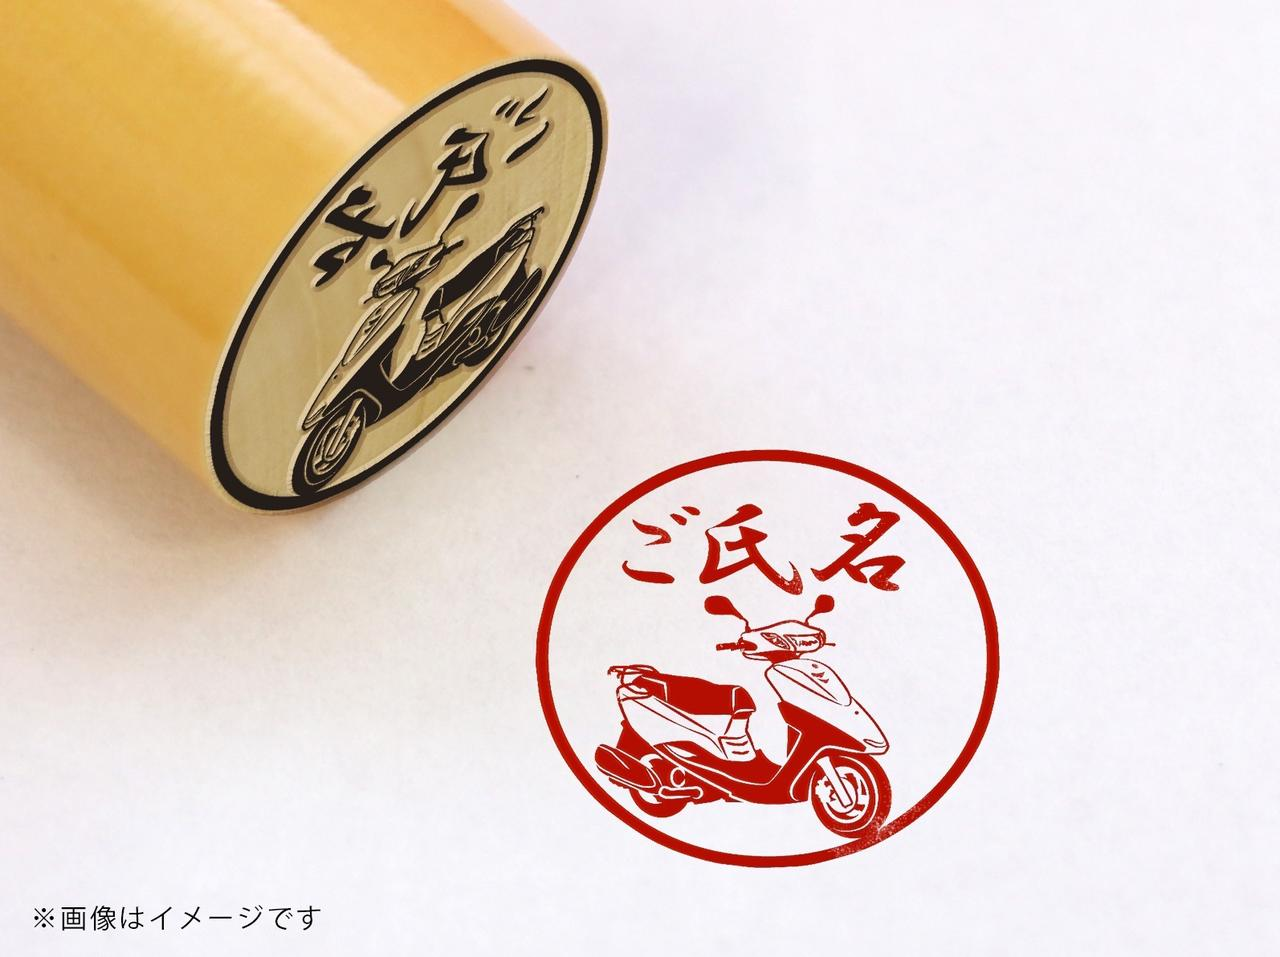 Images : 【YAMAHA】アクシス トリート・柘植丸印18mm